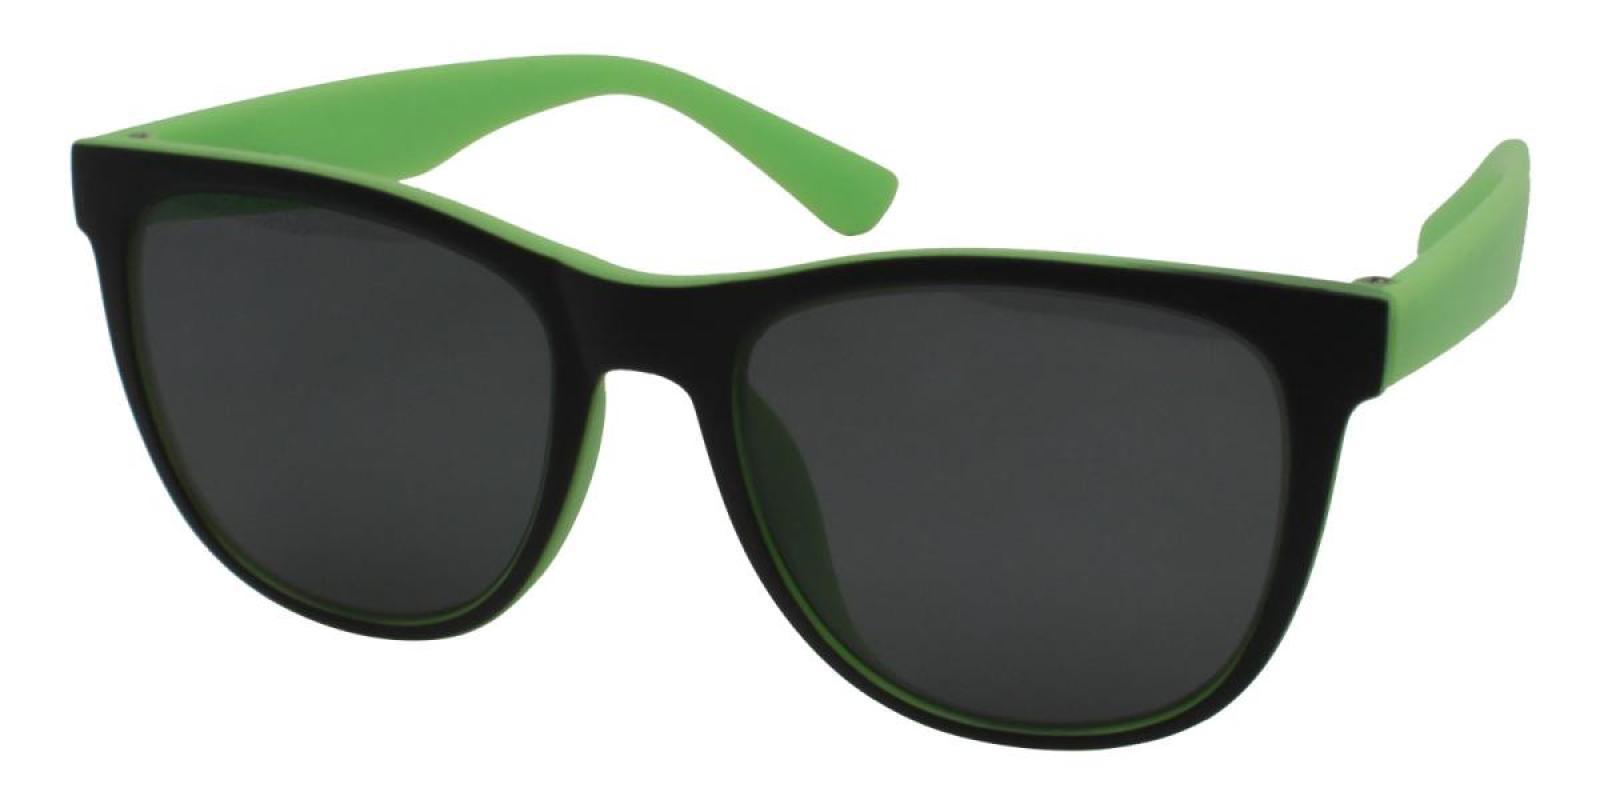 Malibu-Green-Cat-TR-Sunglasses-additional1